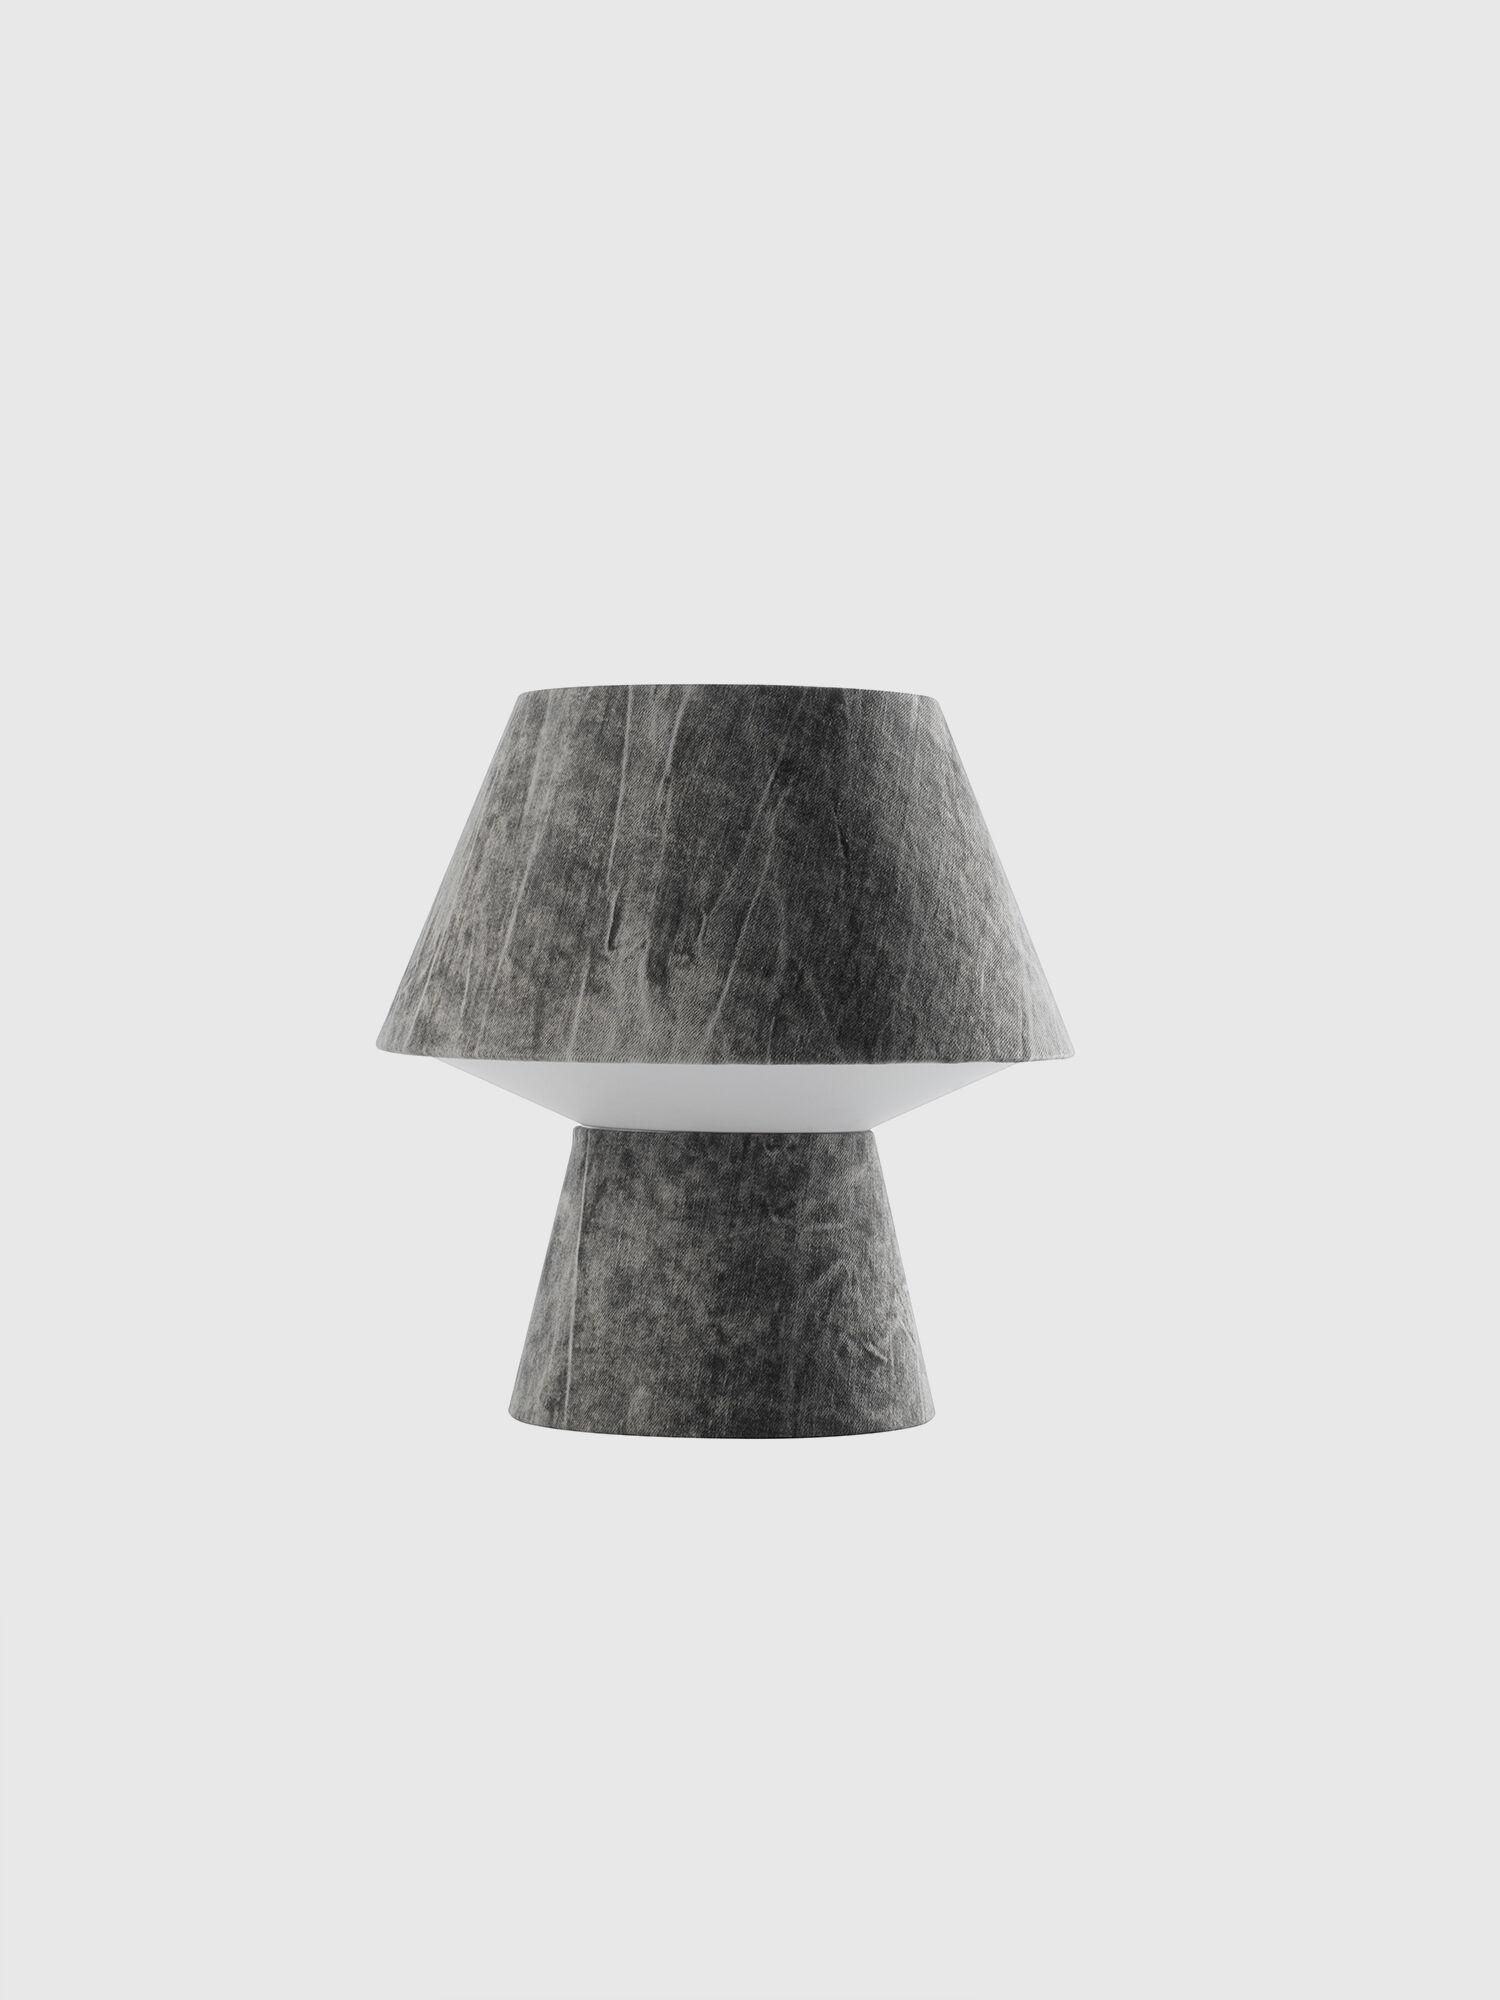 SOFT POWER PICCOLA, Black   Table Lighting